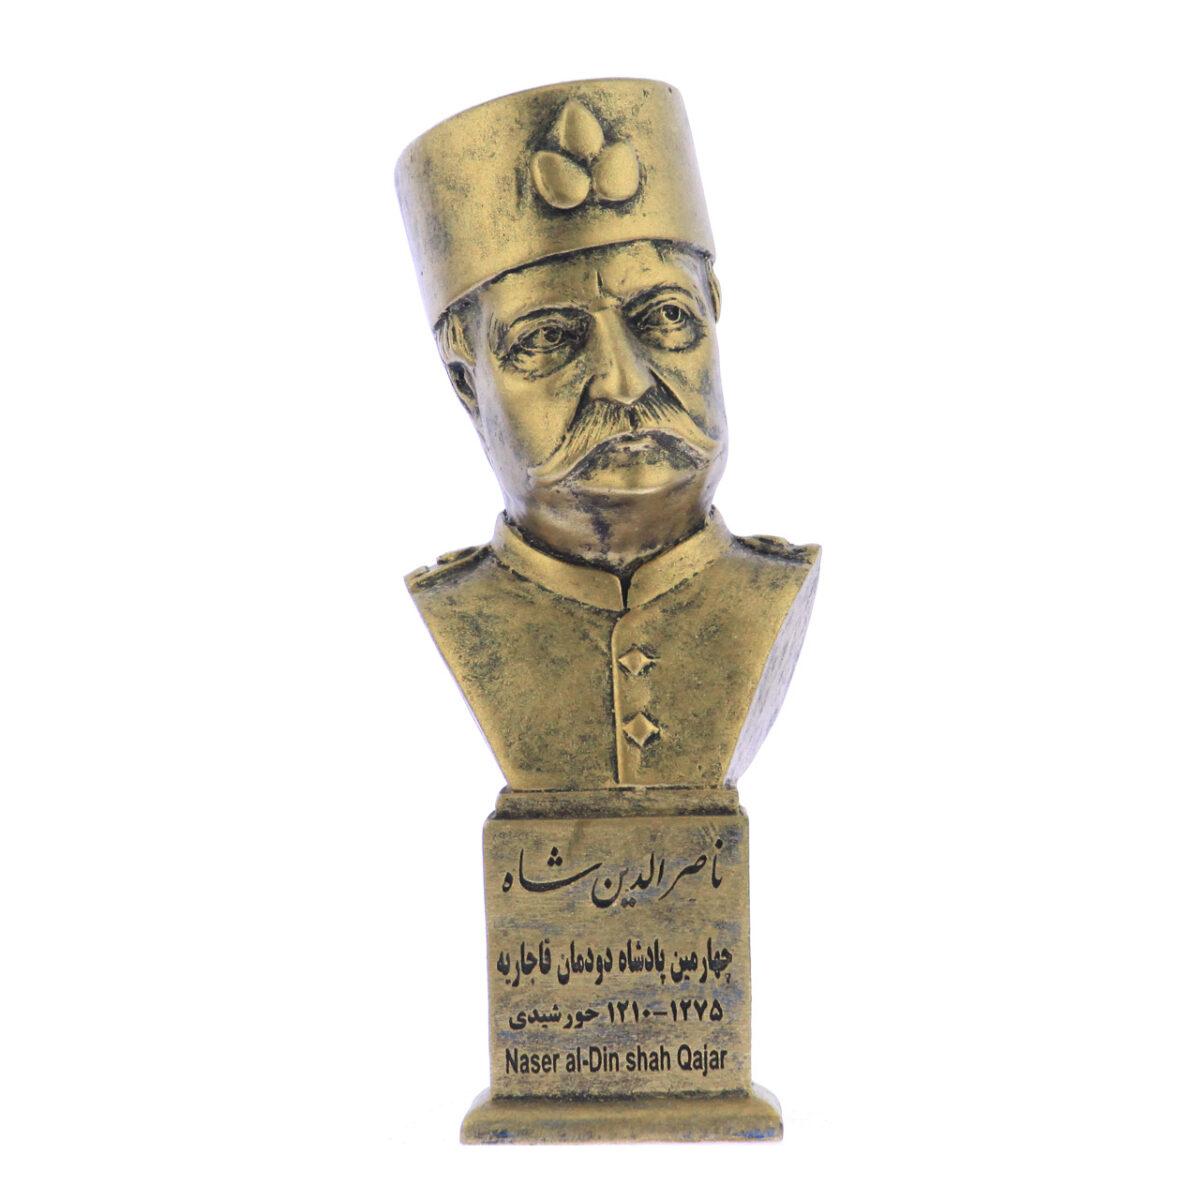 nase adin shah b 1200x1200 - سردیس ناصرالدین شاه قاجار